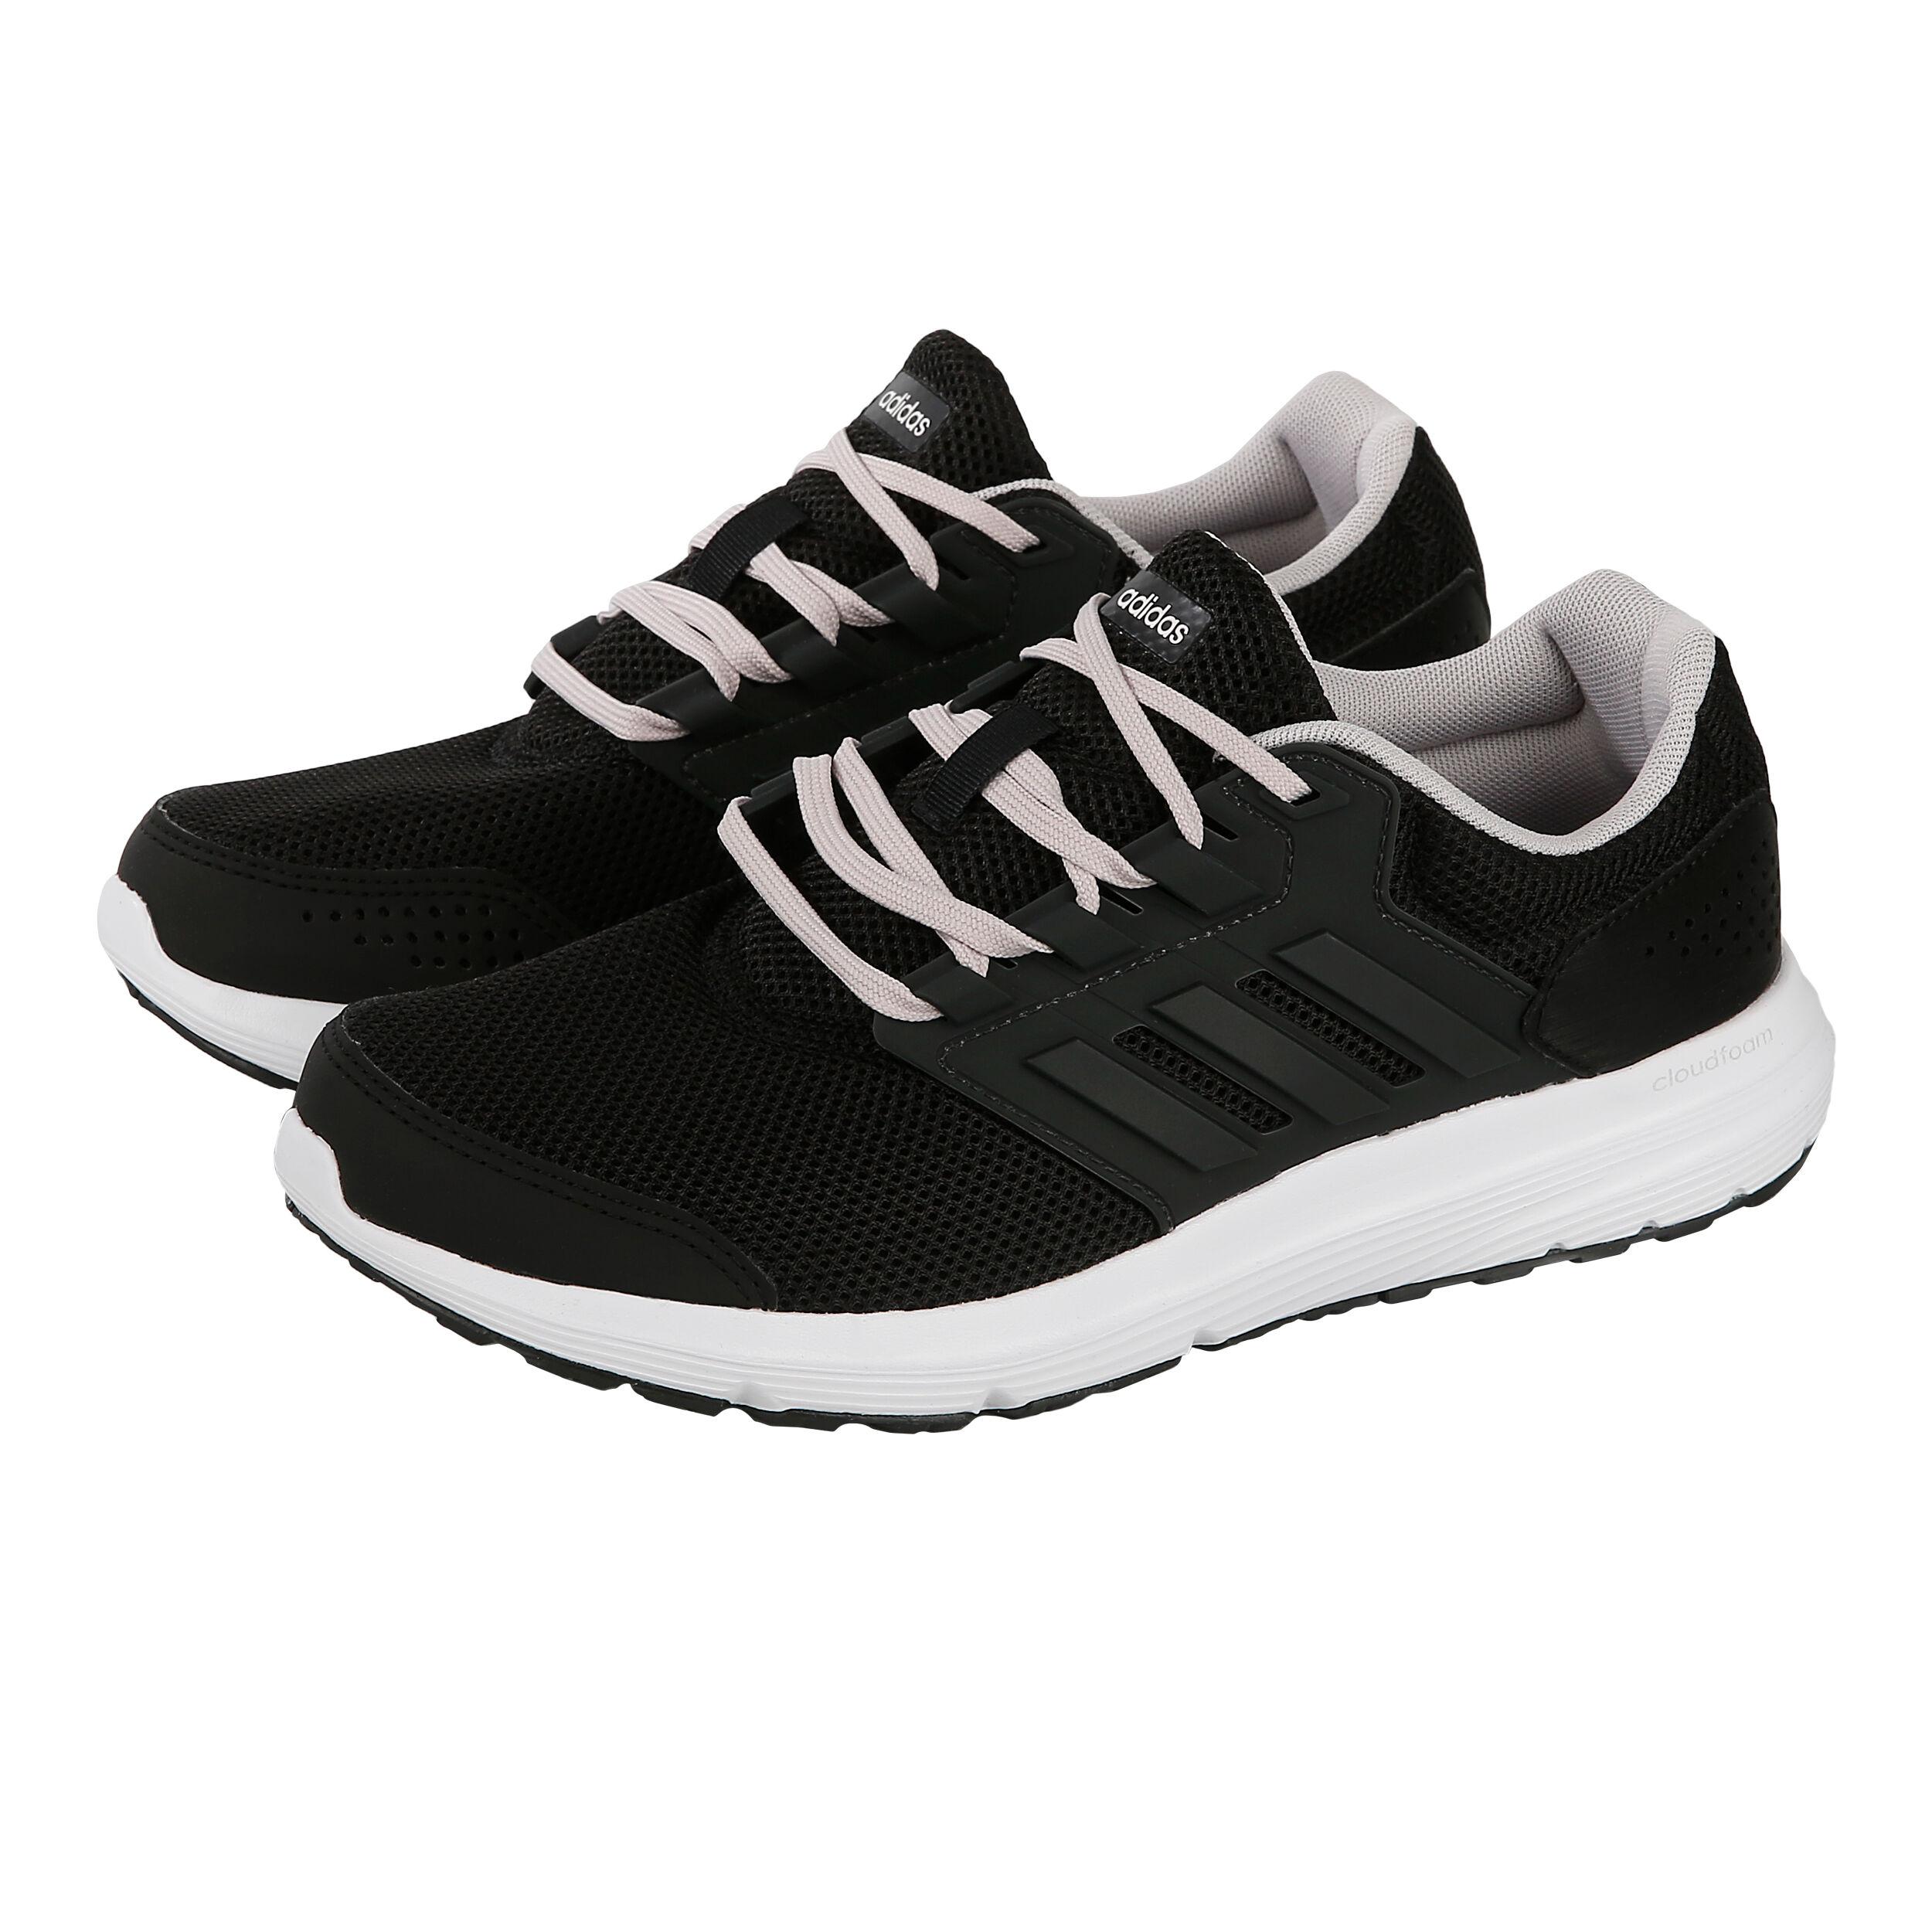 buy adidas Galaxy 4 Neutral Running Shoe Women Black